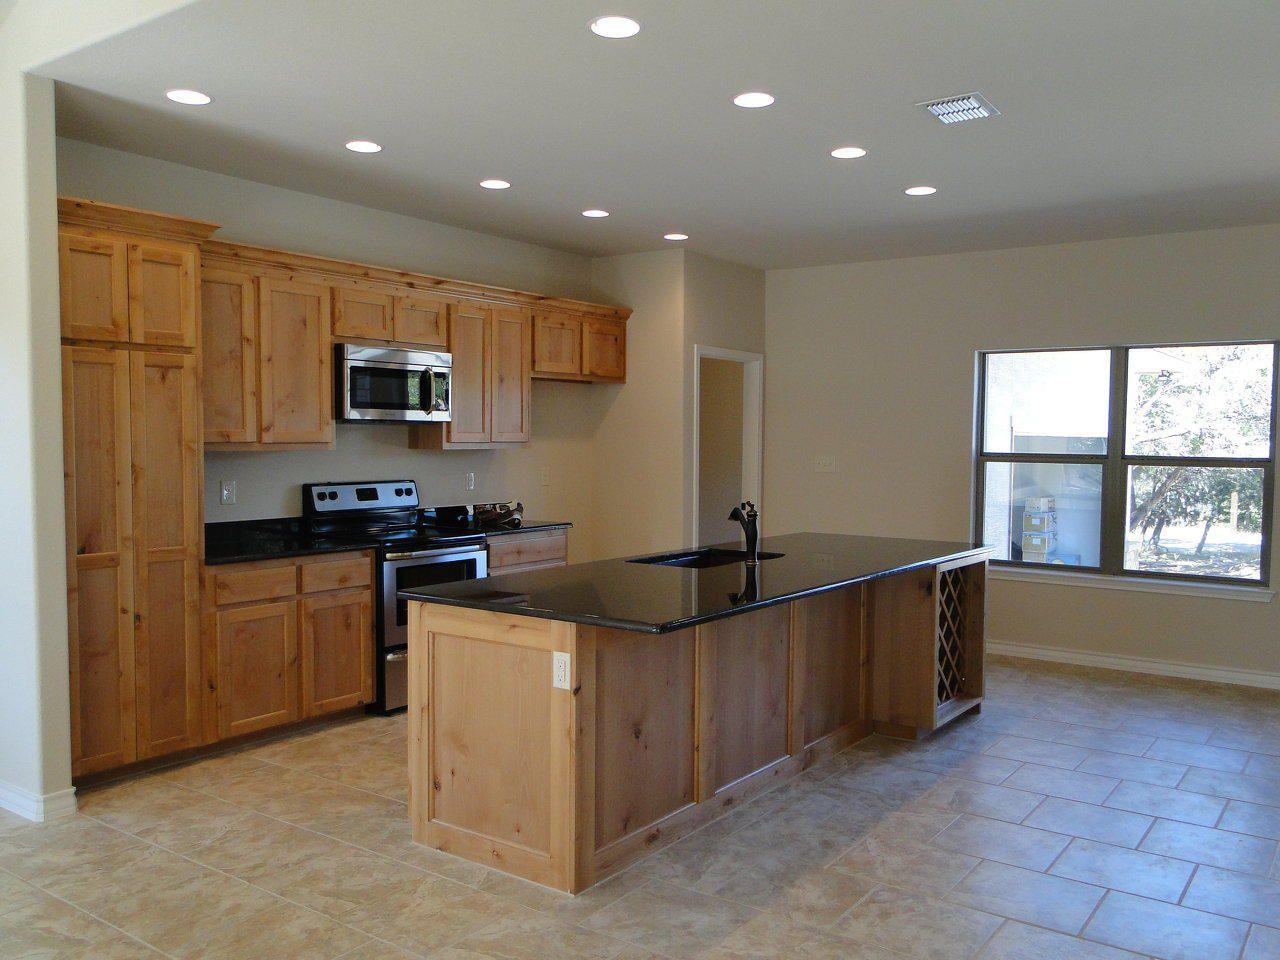 Amaya Custom Cabinets San Antonio TX | ... Custom Homes, Has Been A Part 50